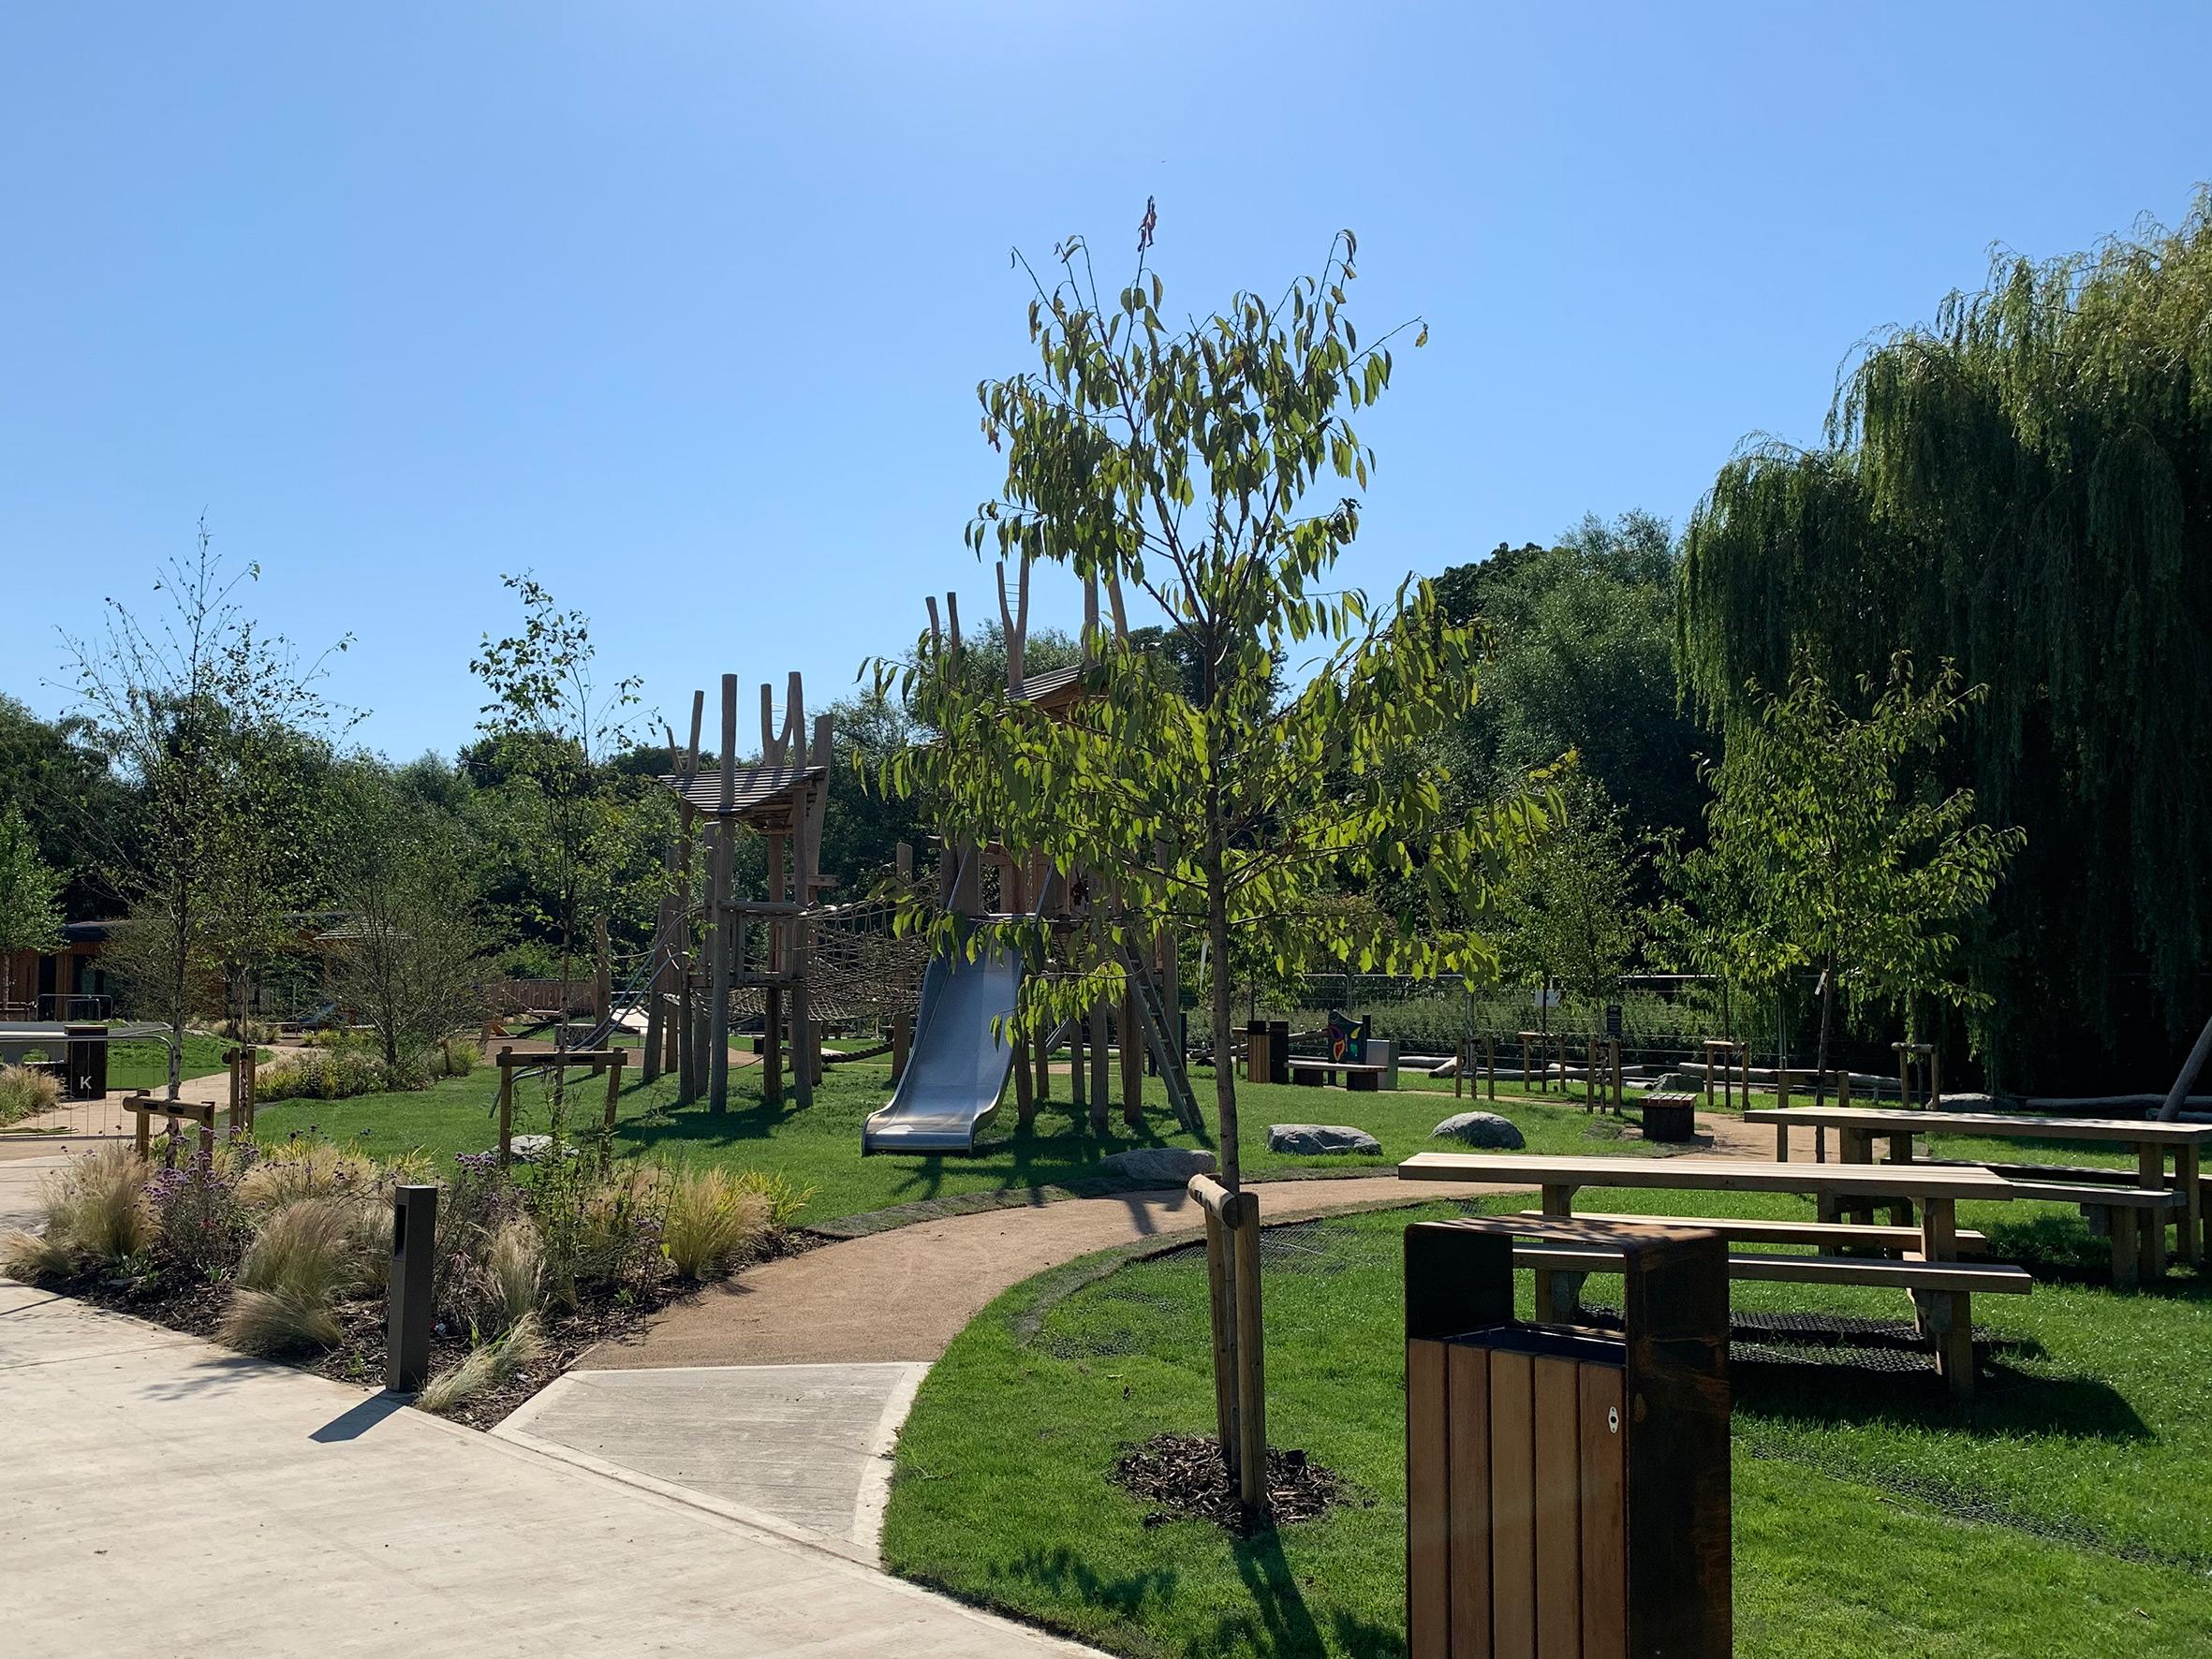 Oxhey Park playground